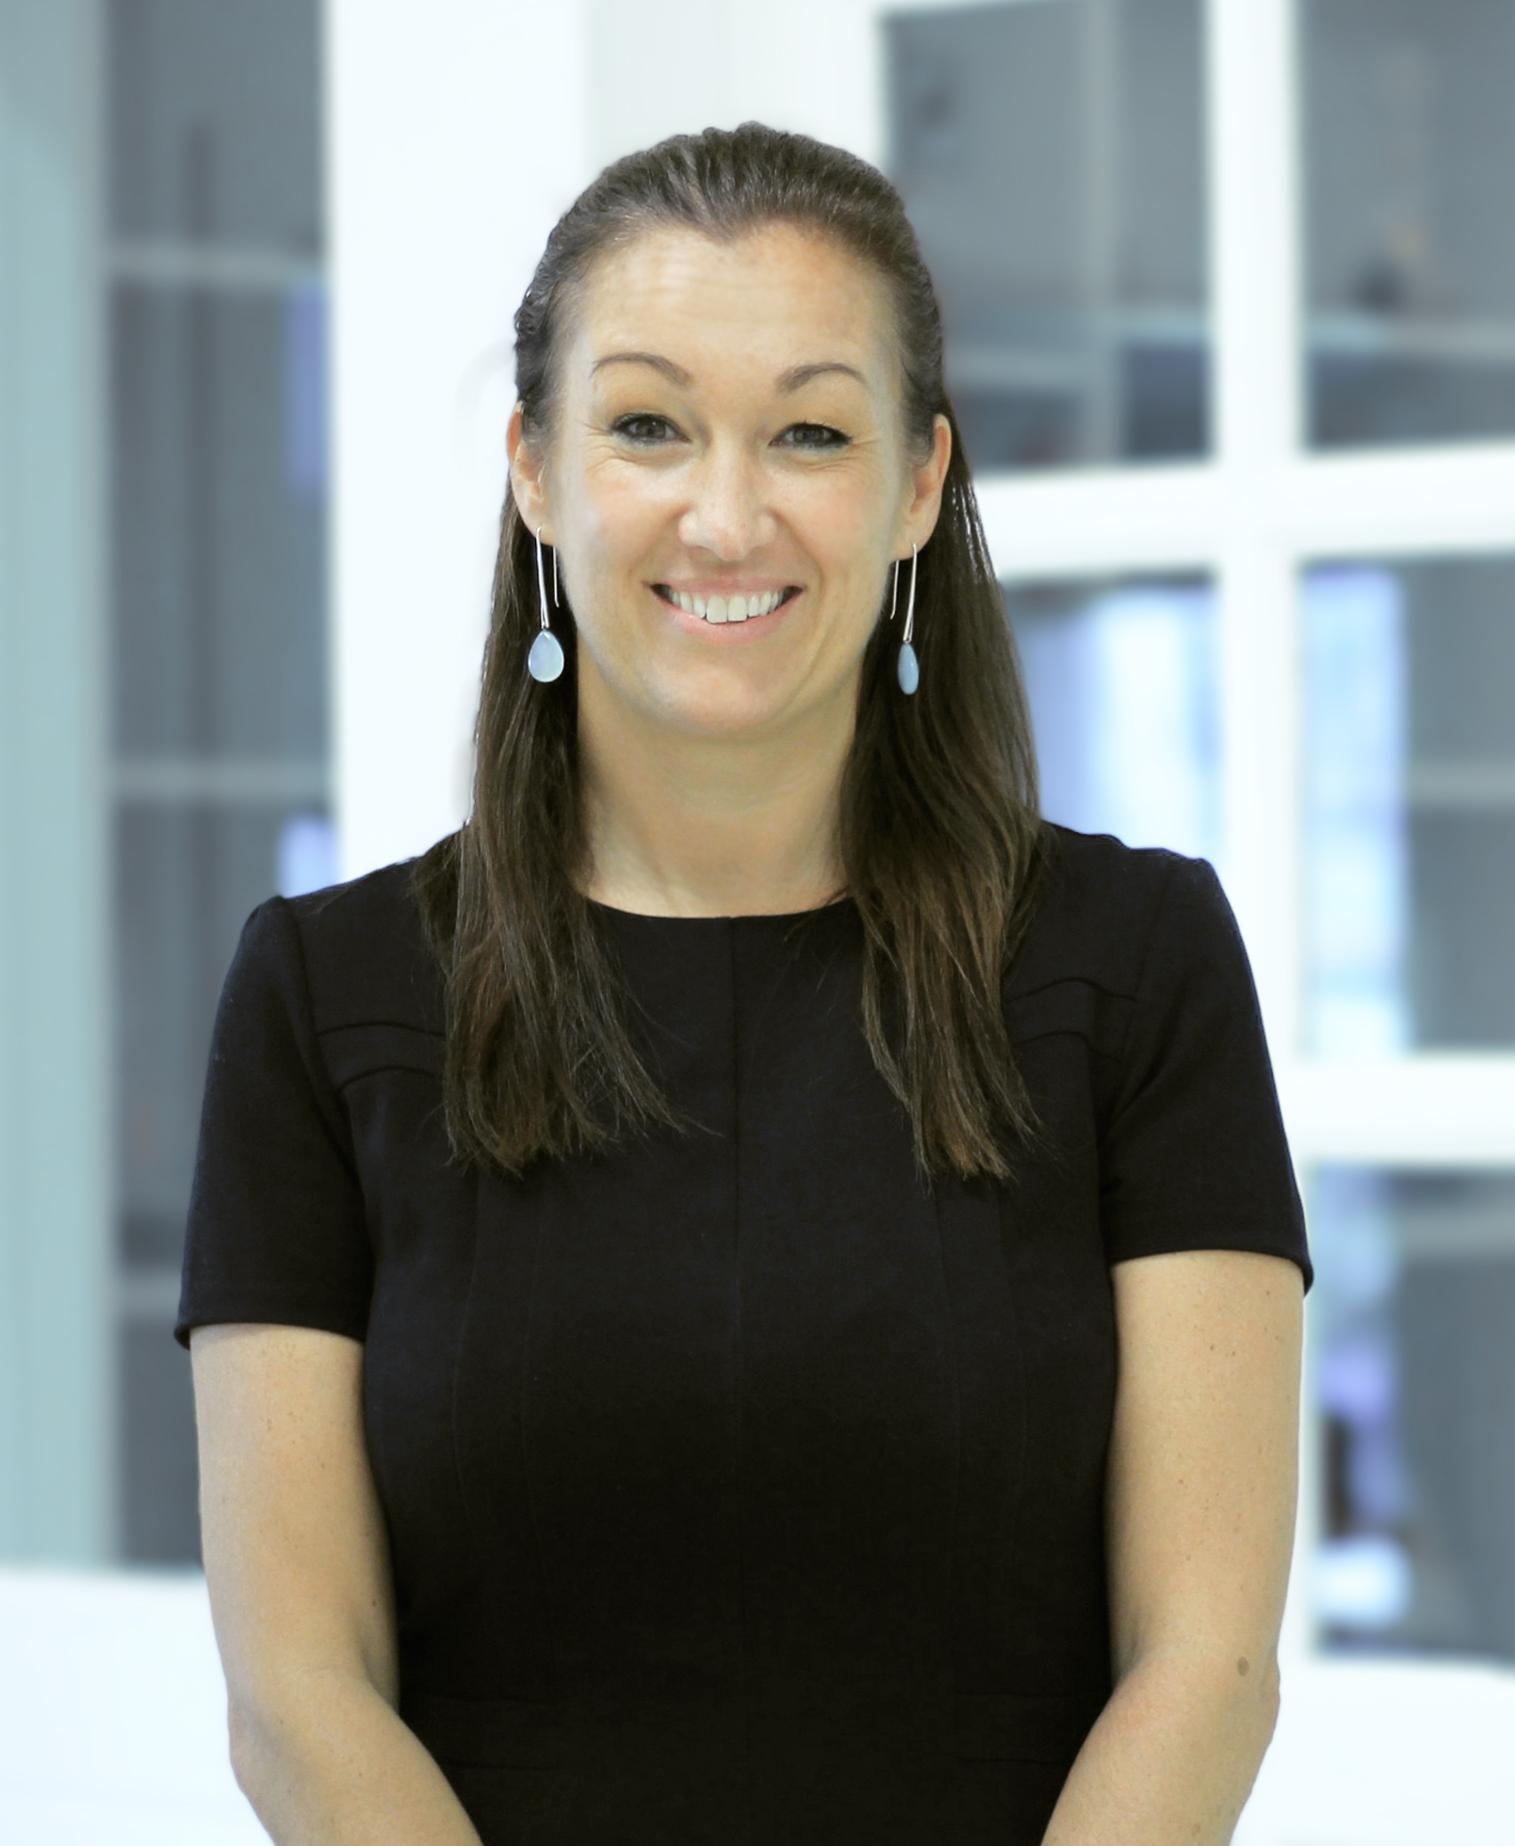 Ms Sarah Osborne-James has been appointed Principal of Regents International School Pattaya.